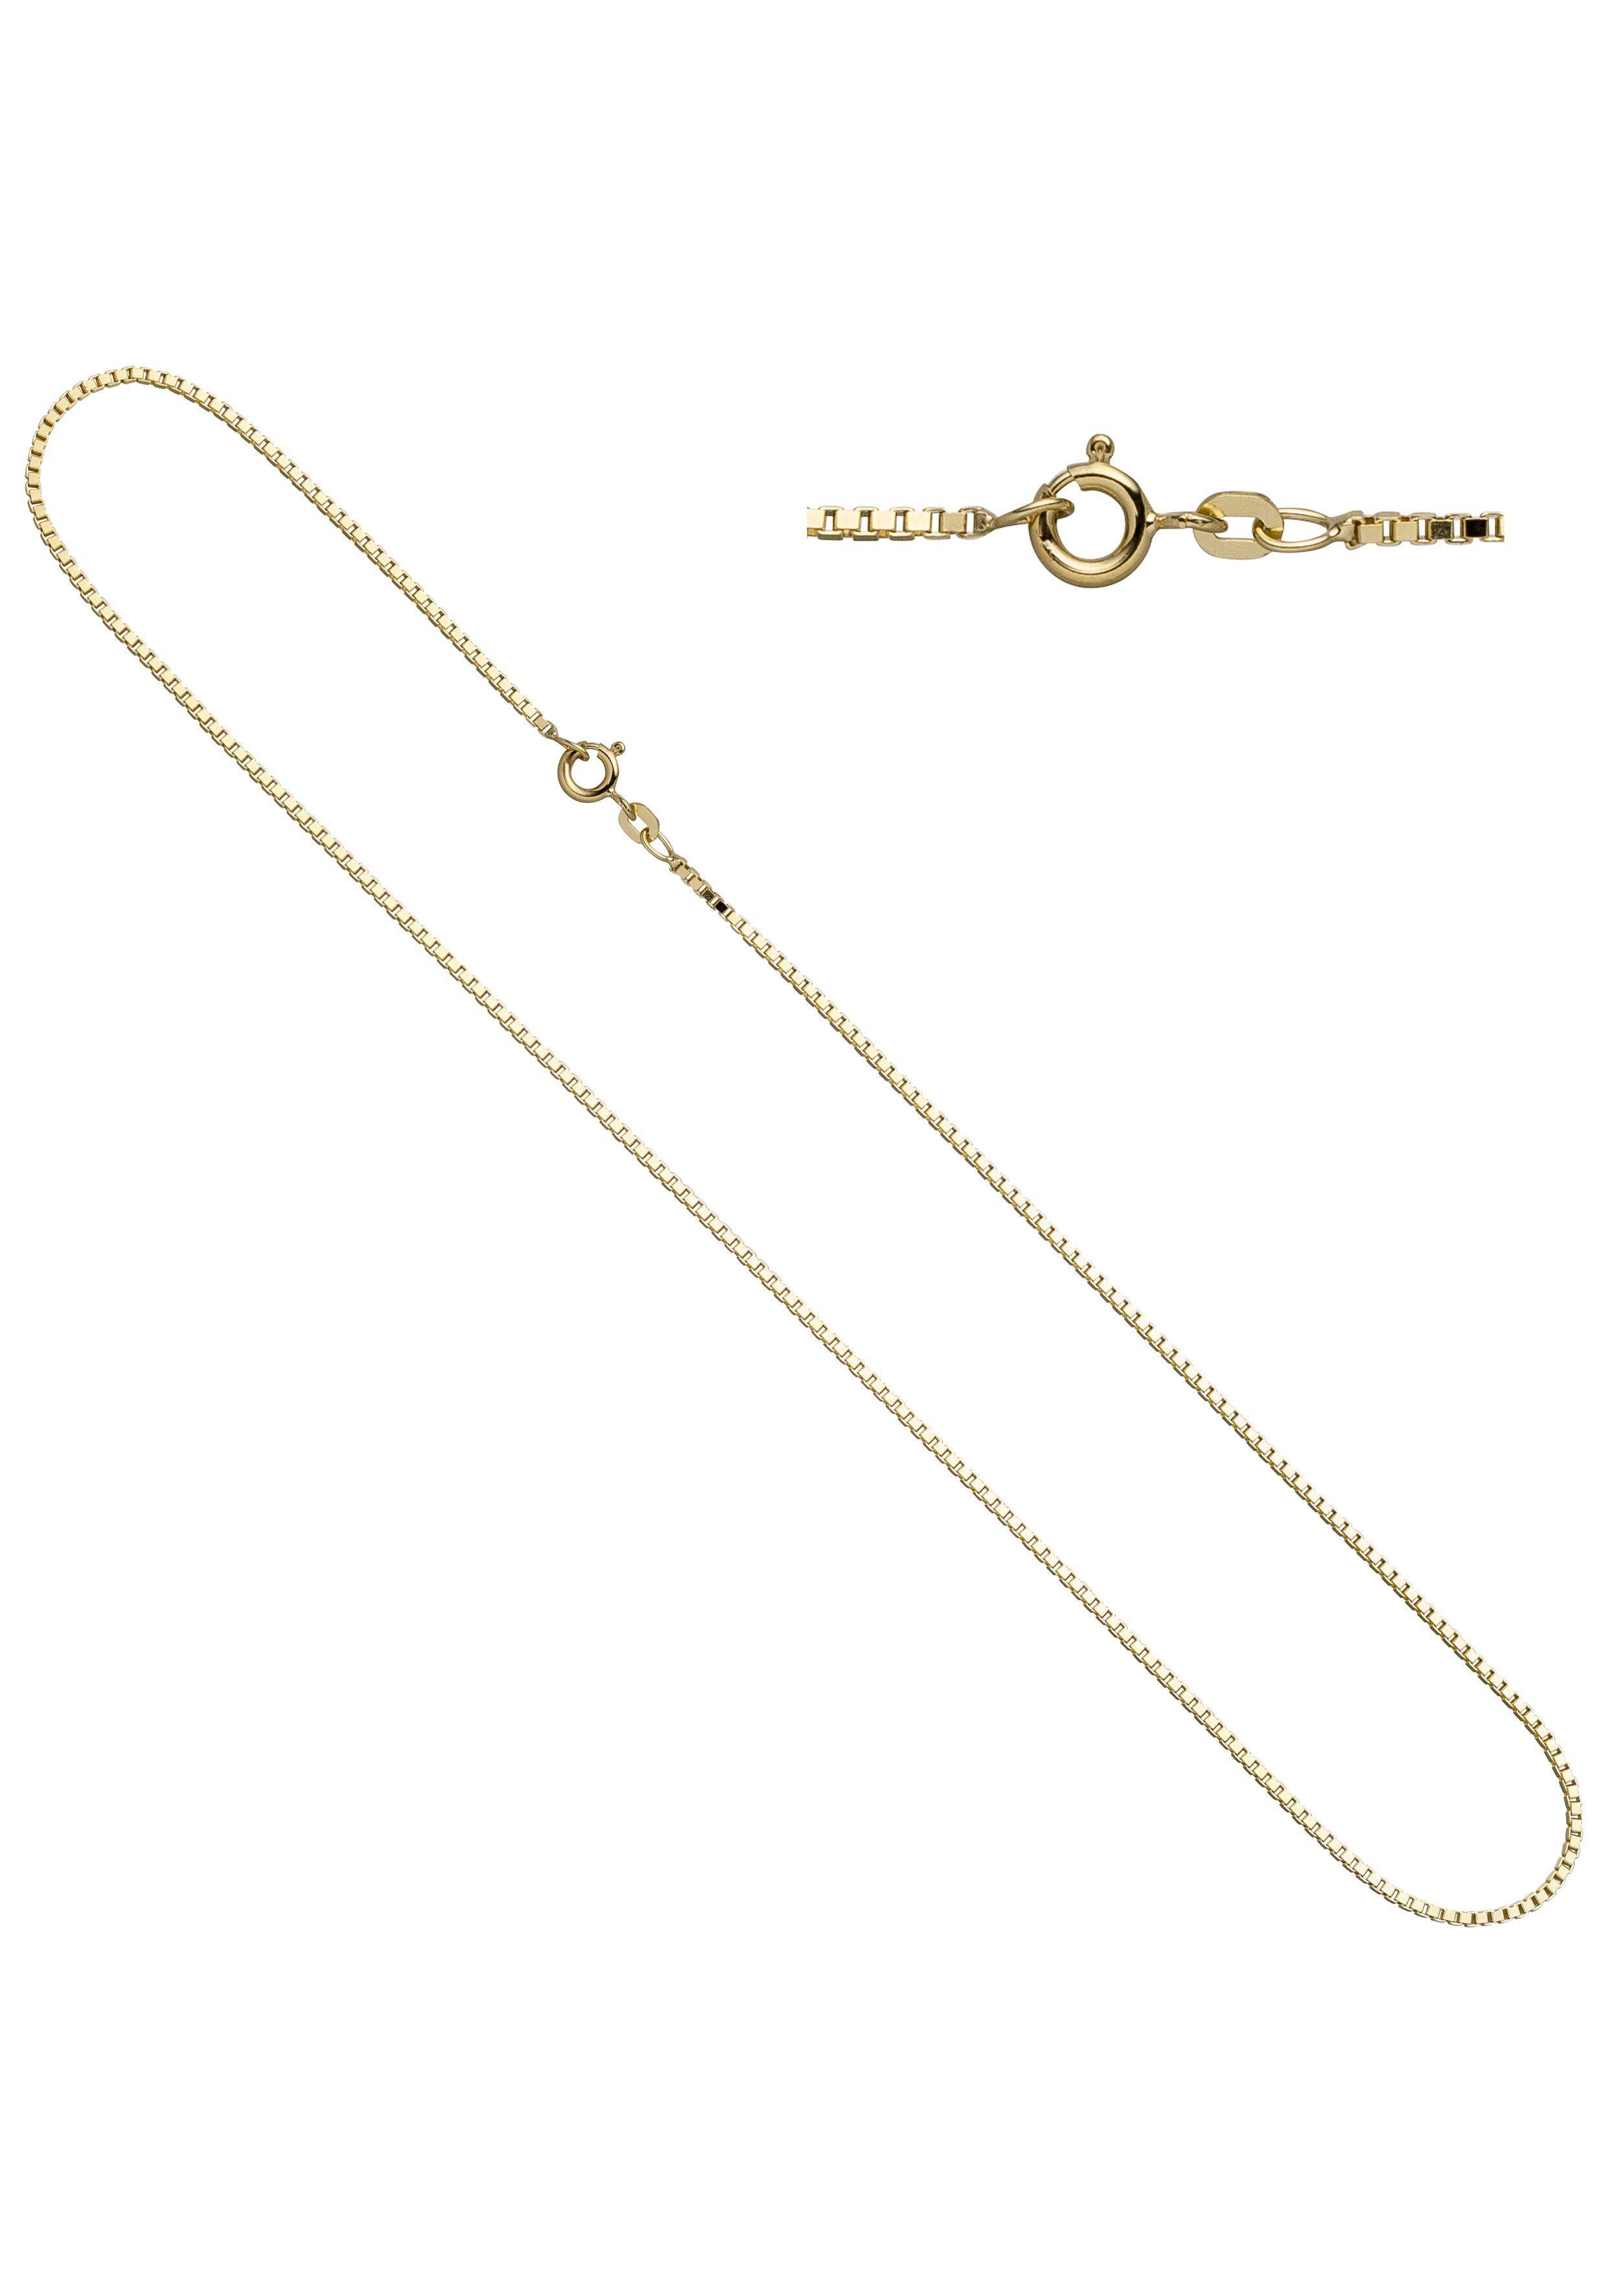 JOBO Goldkette Venezianerkette 333 Gold 42 cm 1,0 mm